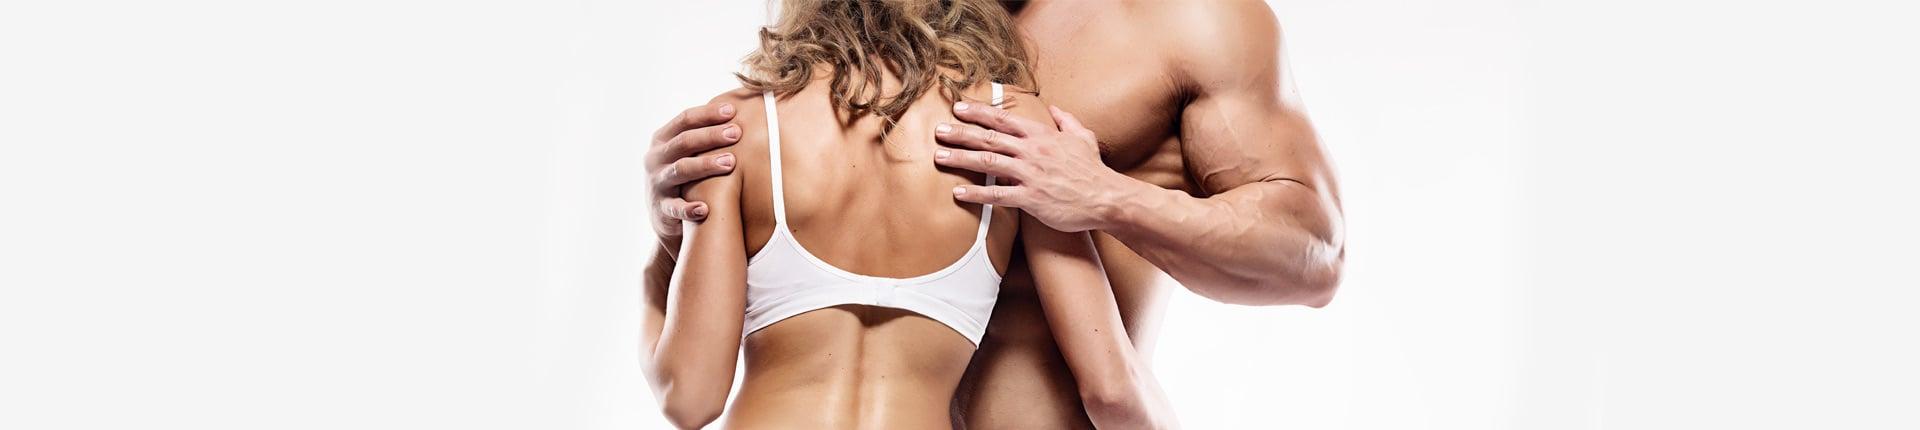 Seks a trening na siłowni